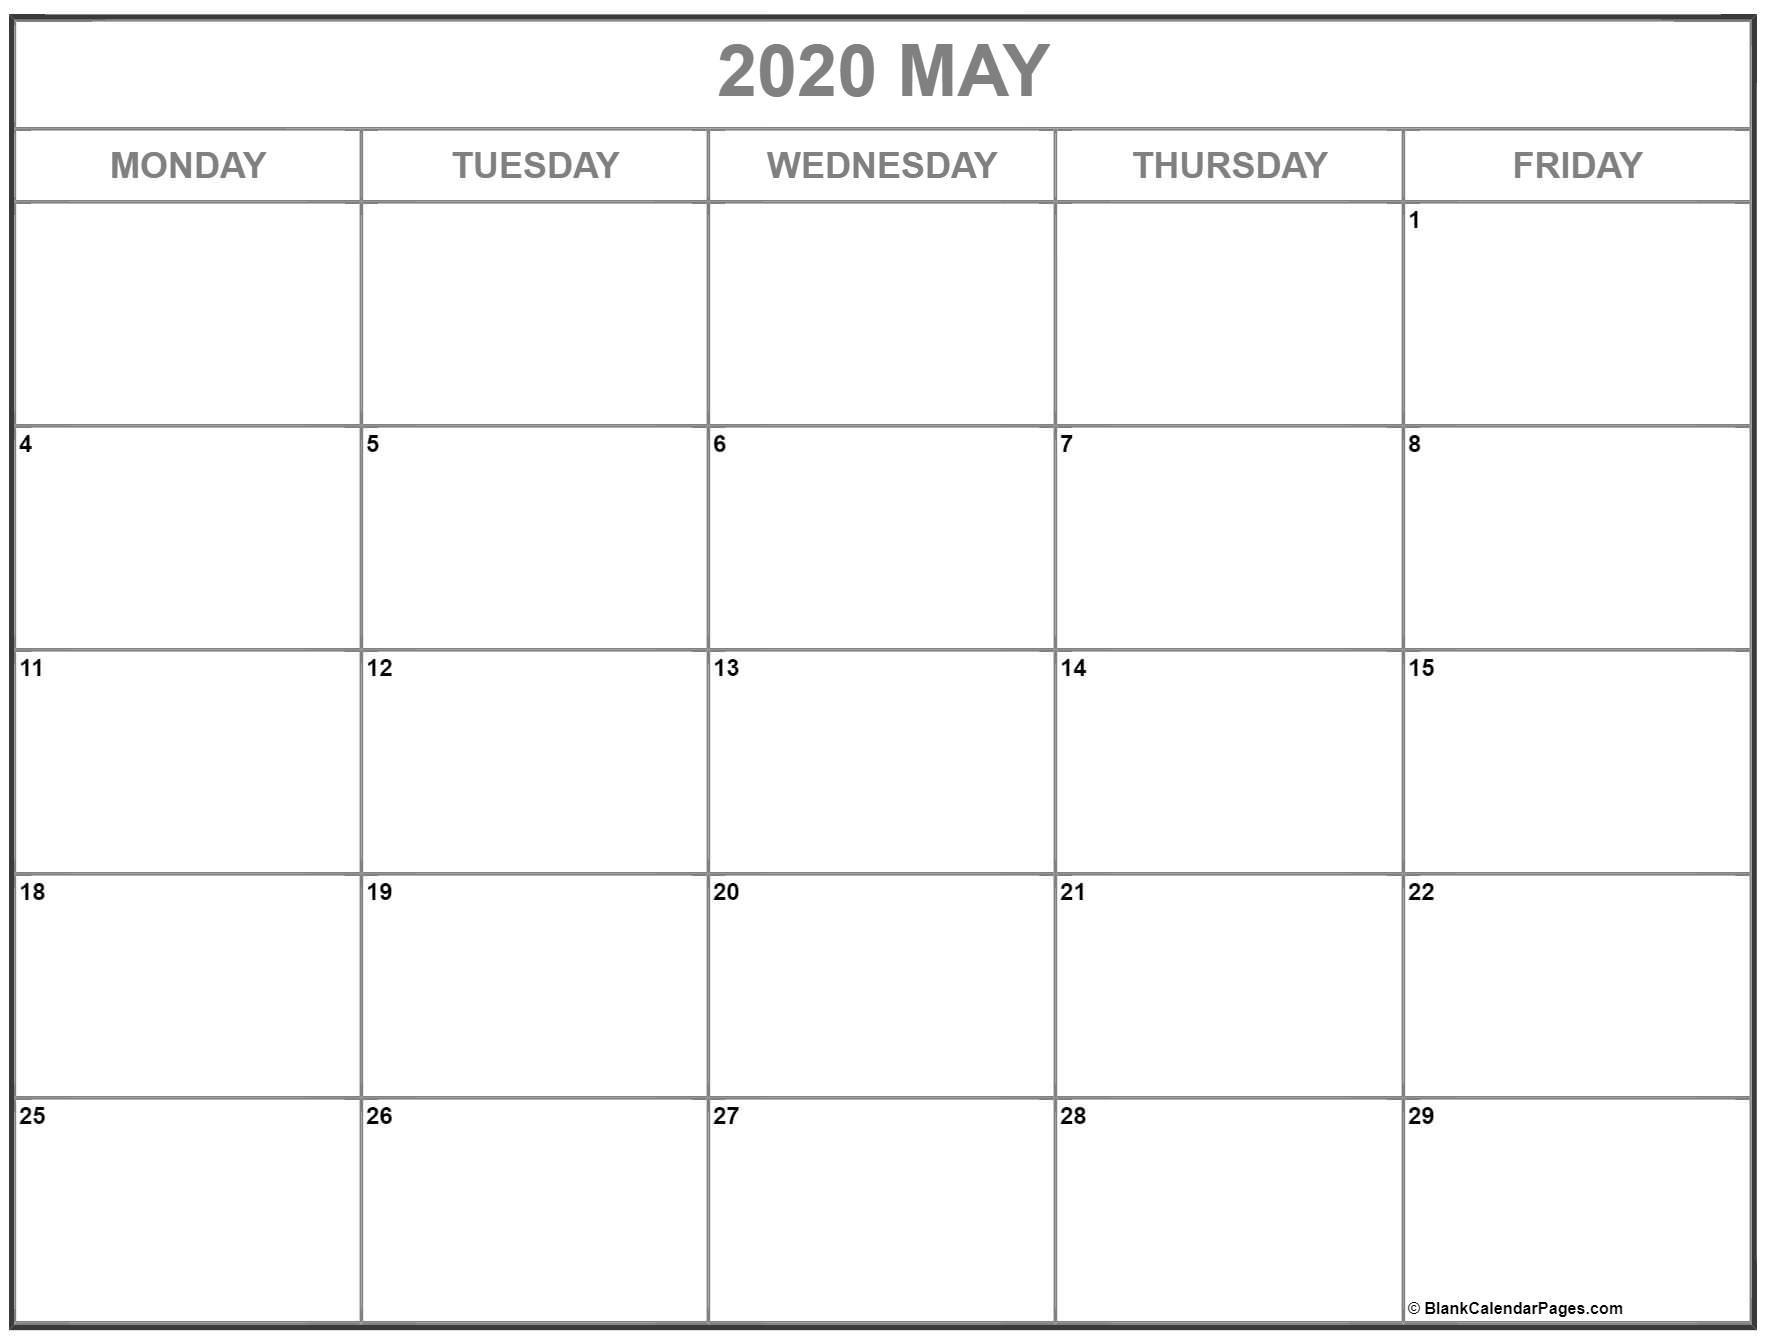 May 2020 Monday Calendar | Monday To Sunday throughout Printable Calendar 2020 Monday To Sunday